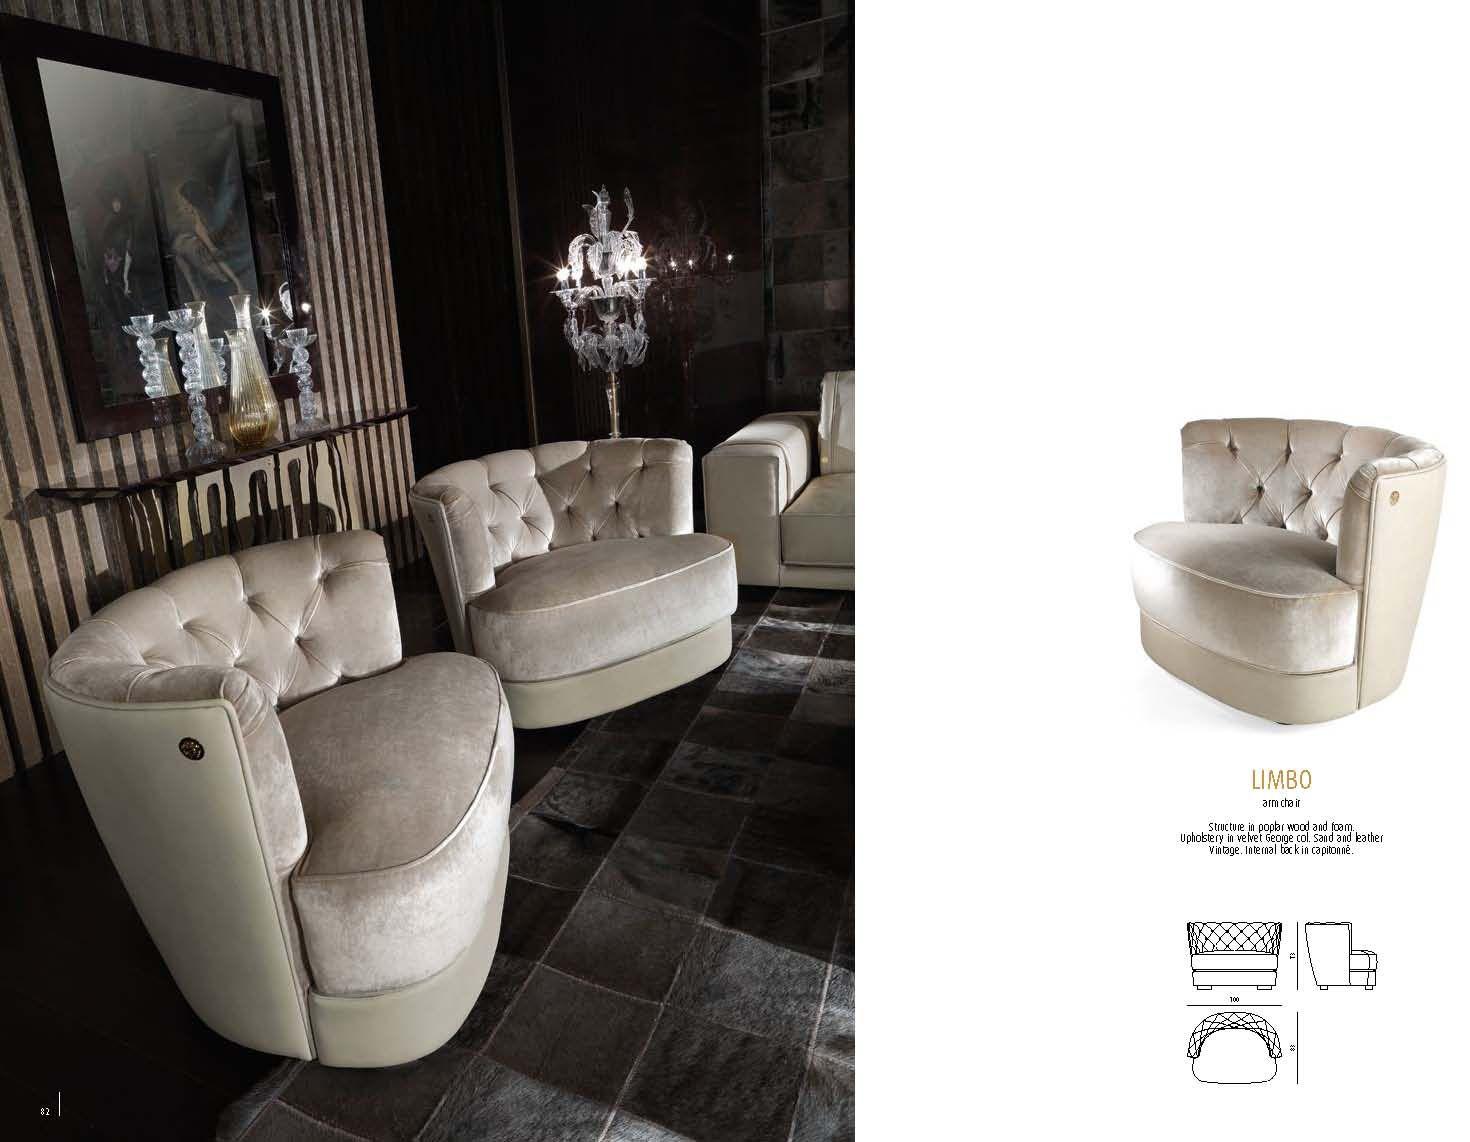 Roberto Cavalli Furniture - Muebles de ROBERTO CAVALLI serie FUMAR ...